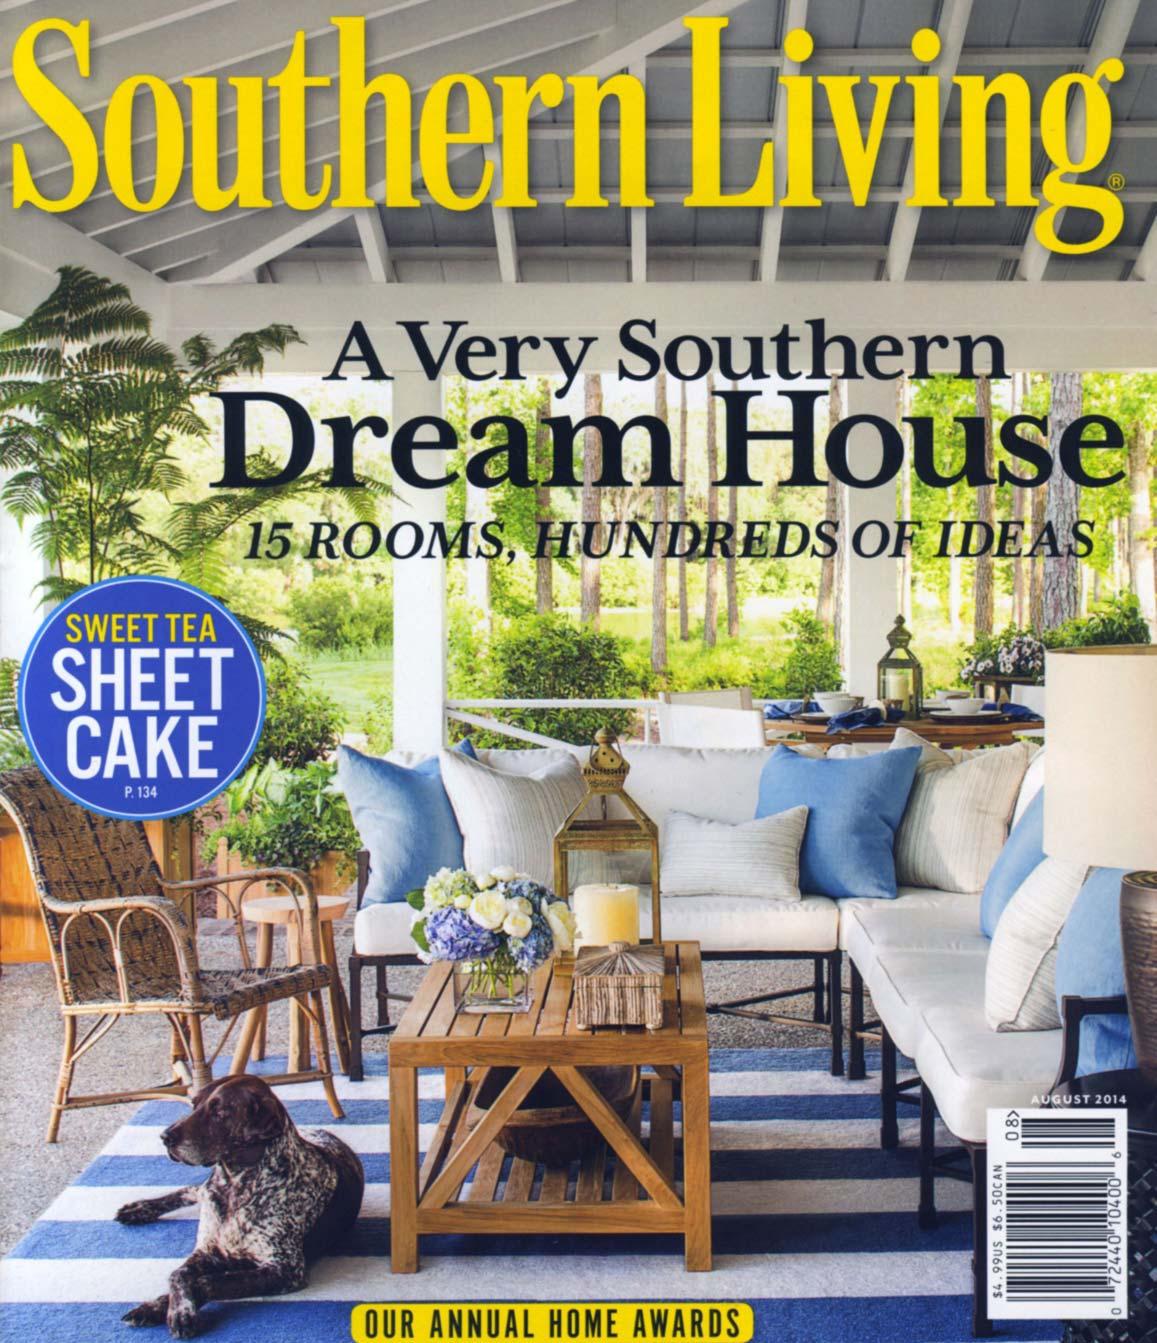 ClayMcLaurinStudio_Southern_Living_2014_cover_web.jpg